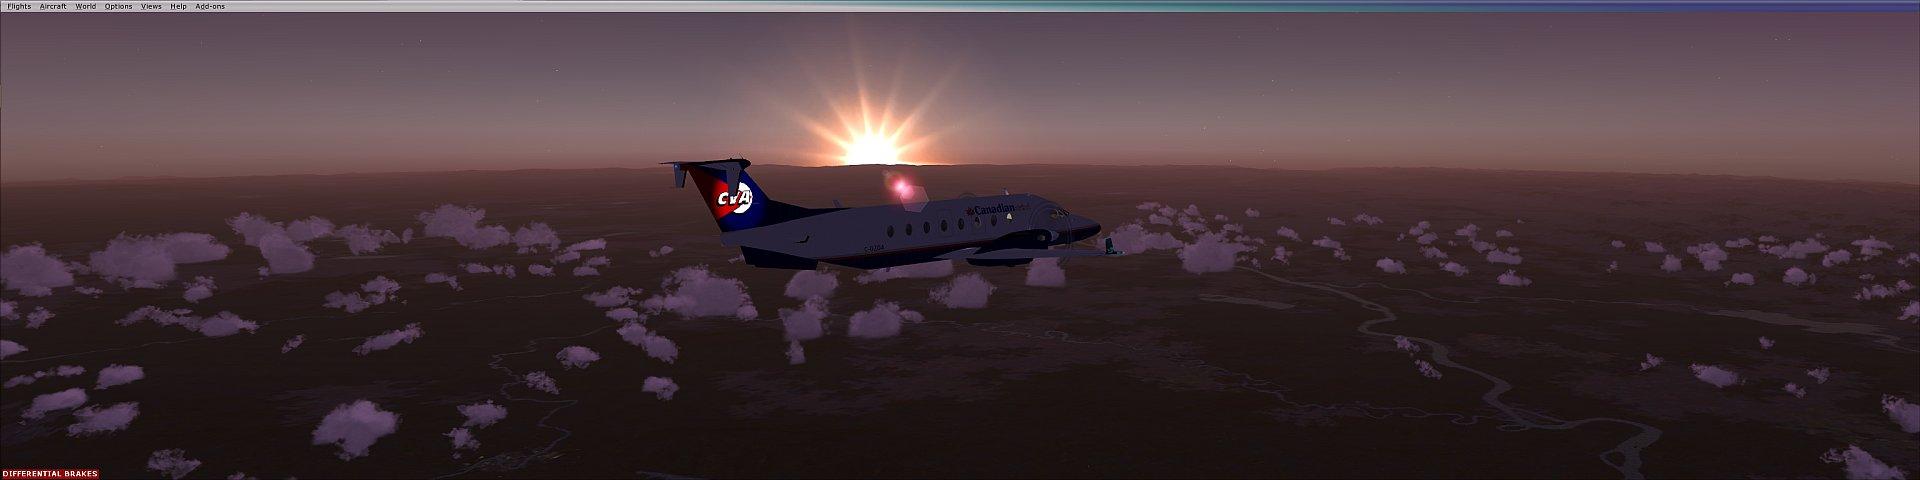 Lovin' the sunset!